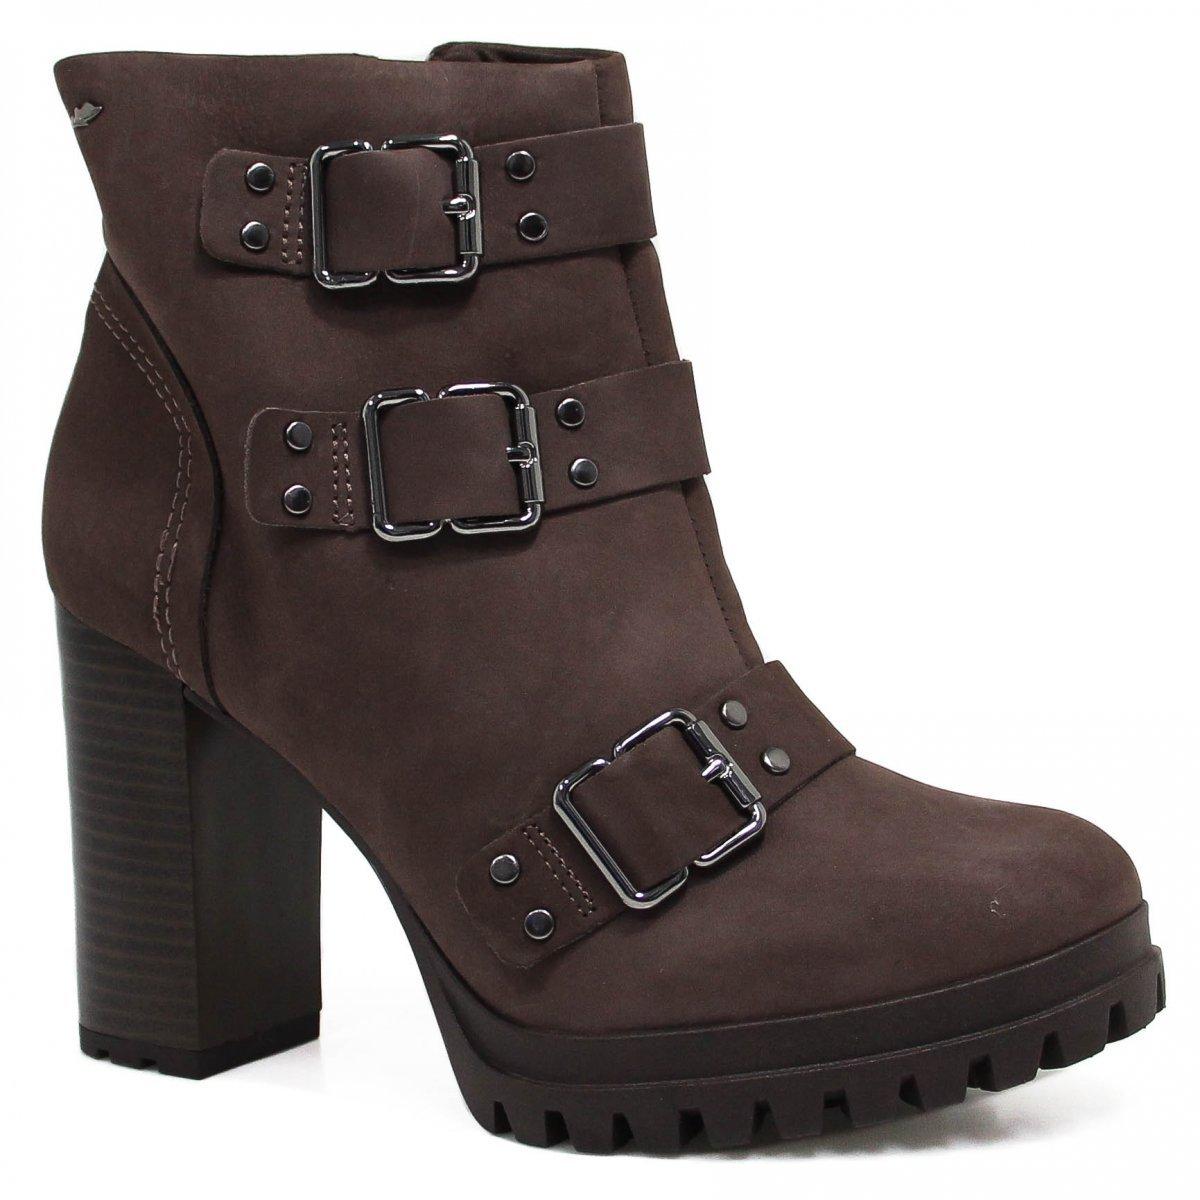 3c018ec90557f Bota Cano Curto Dakota Ankle Boot Fivelas Feminina - Compre Agora ...